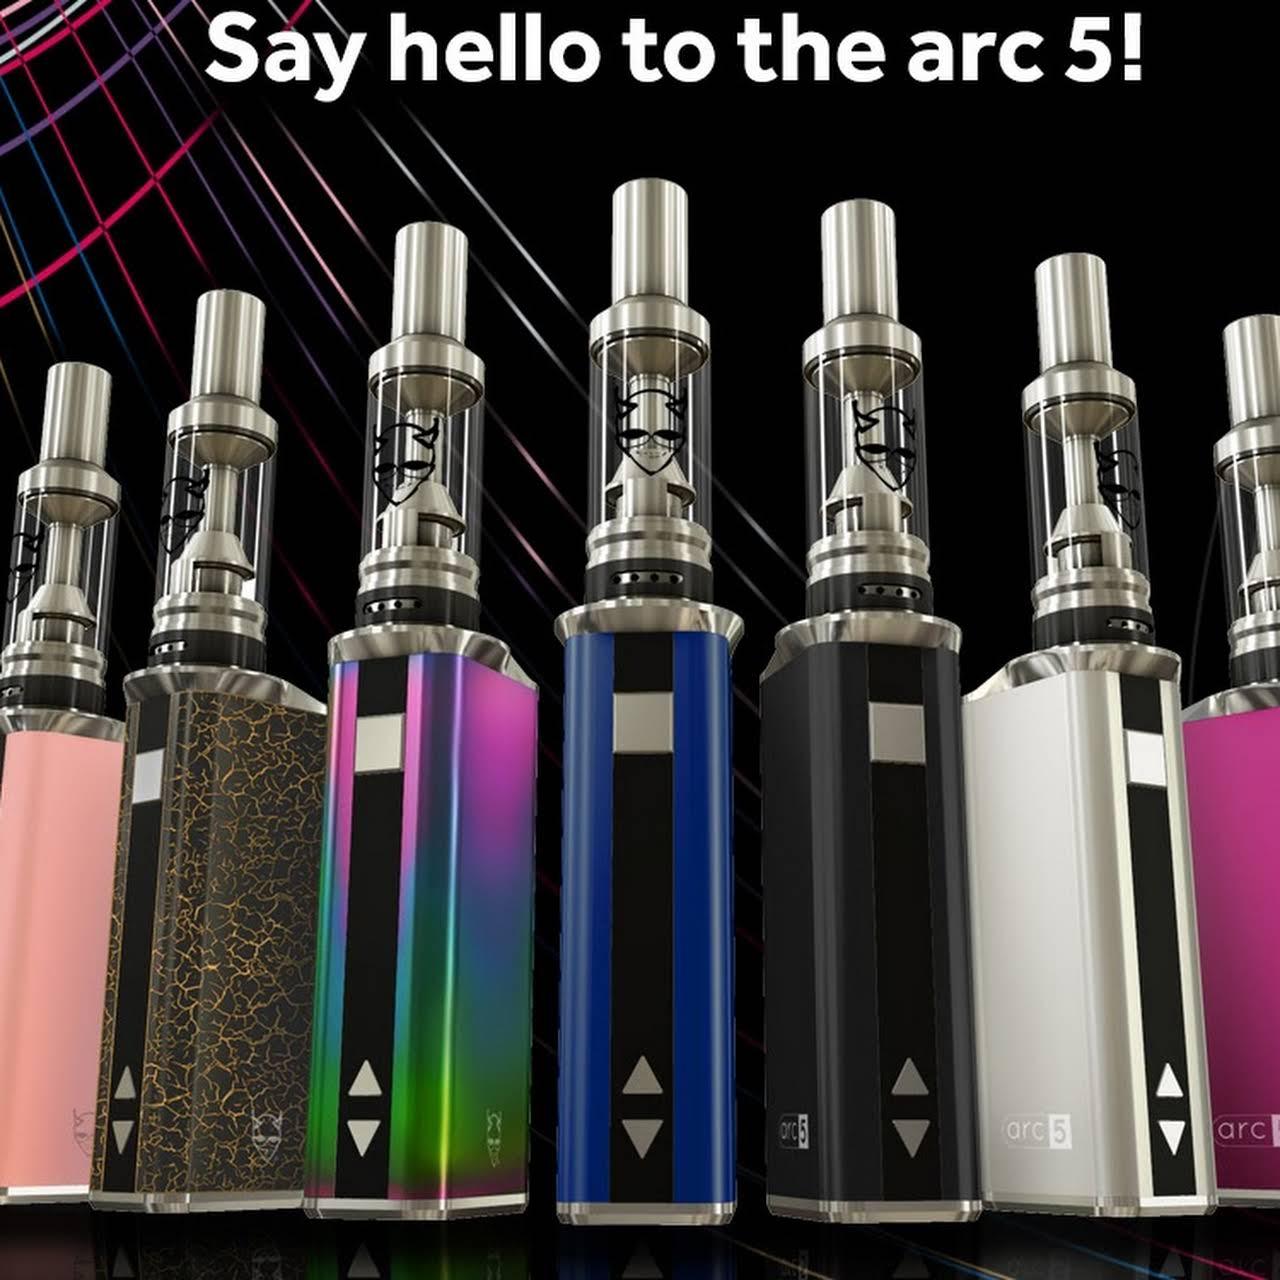 Totally Wicked - E-Cigarette and E-liquid Shop by Cigby's - Premium